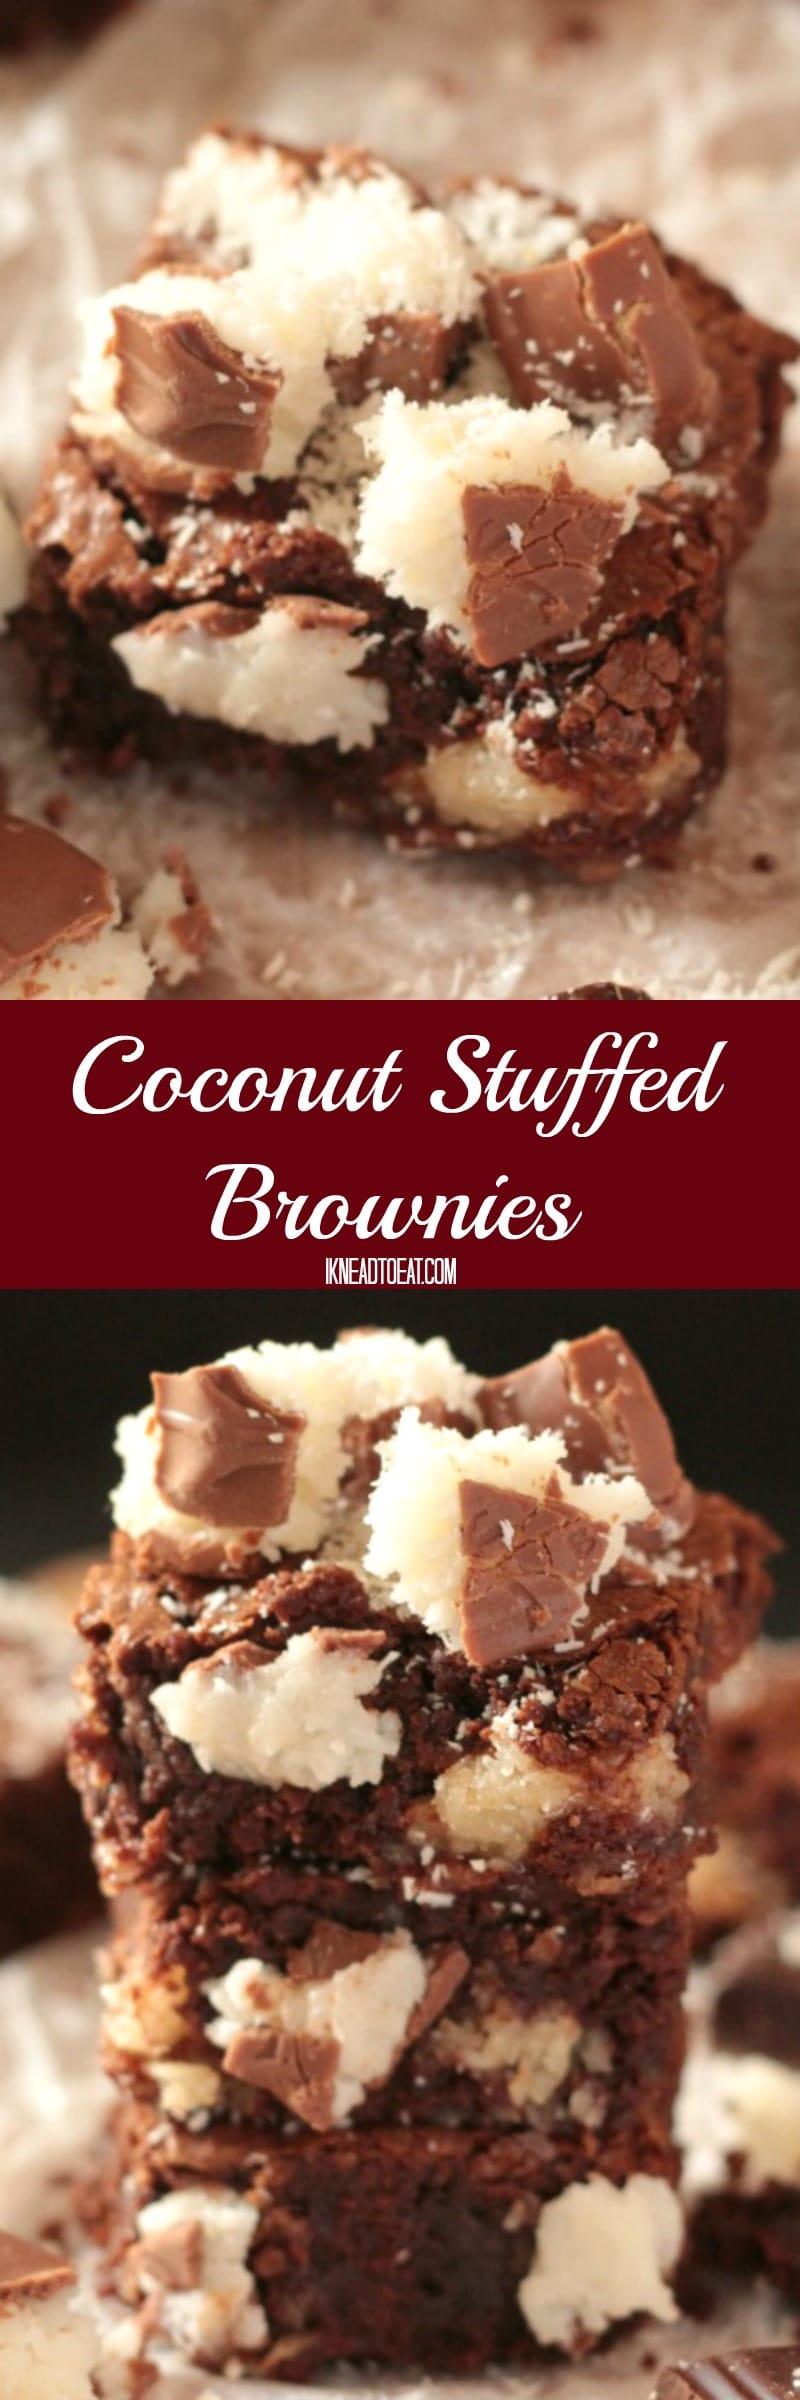 Chewy Coconut Stuffed Brownies